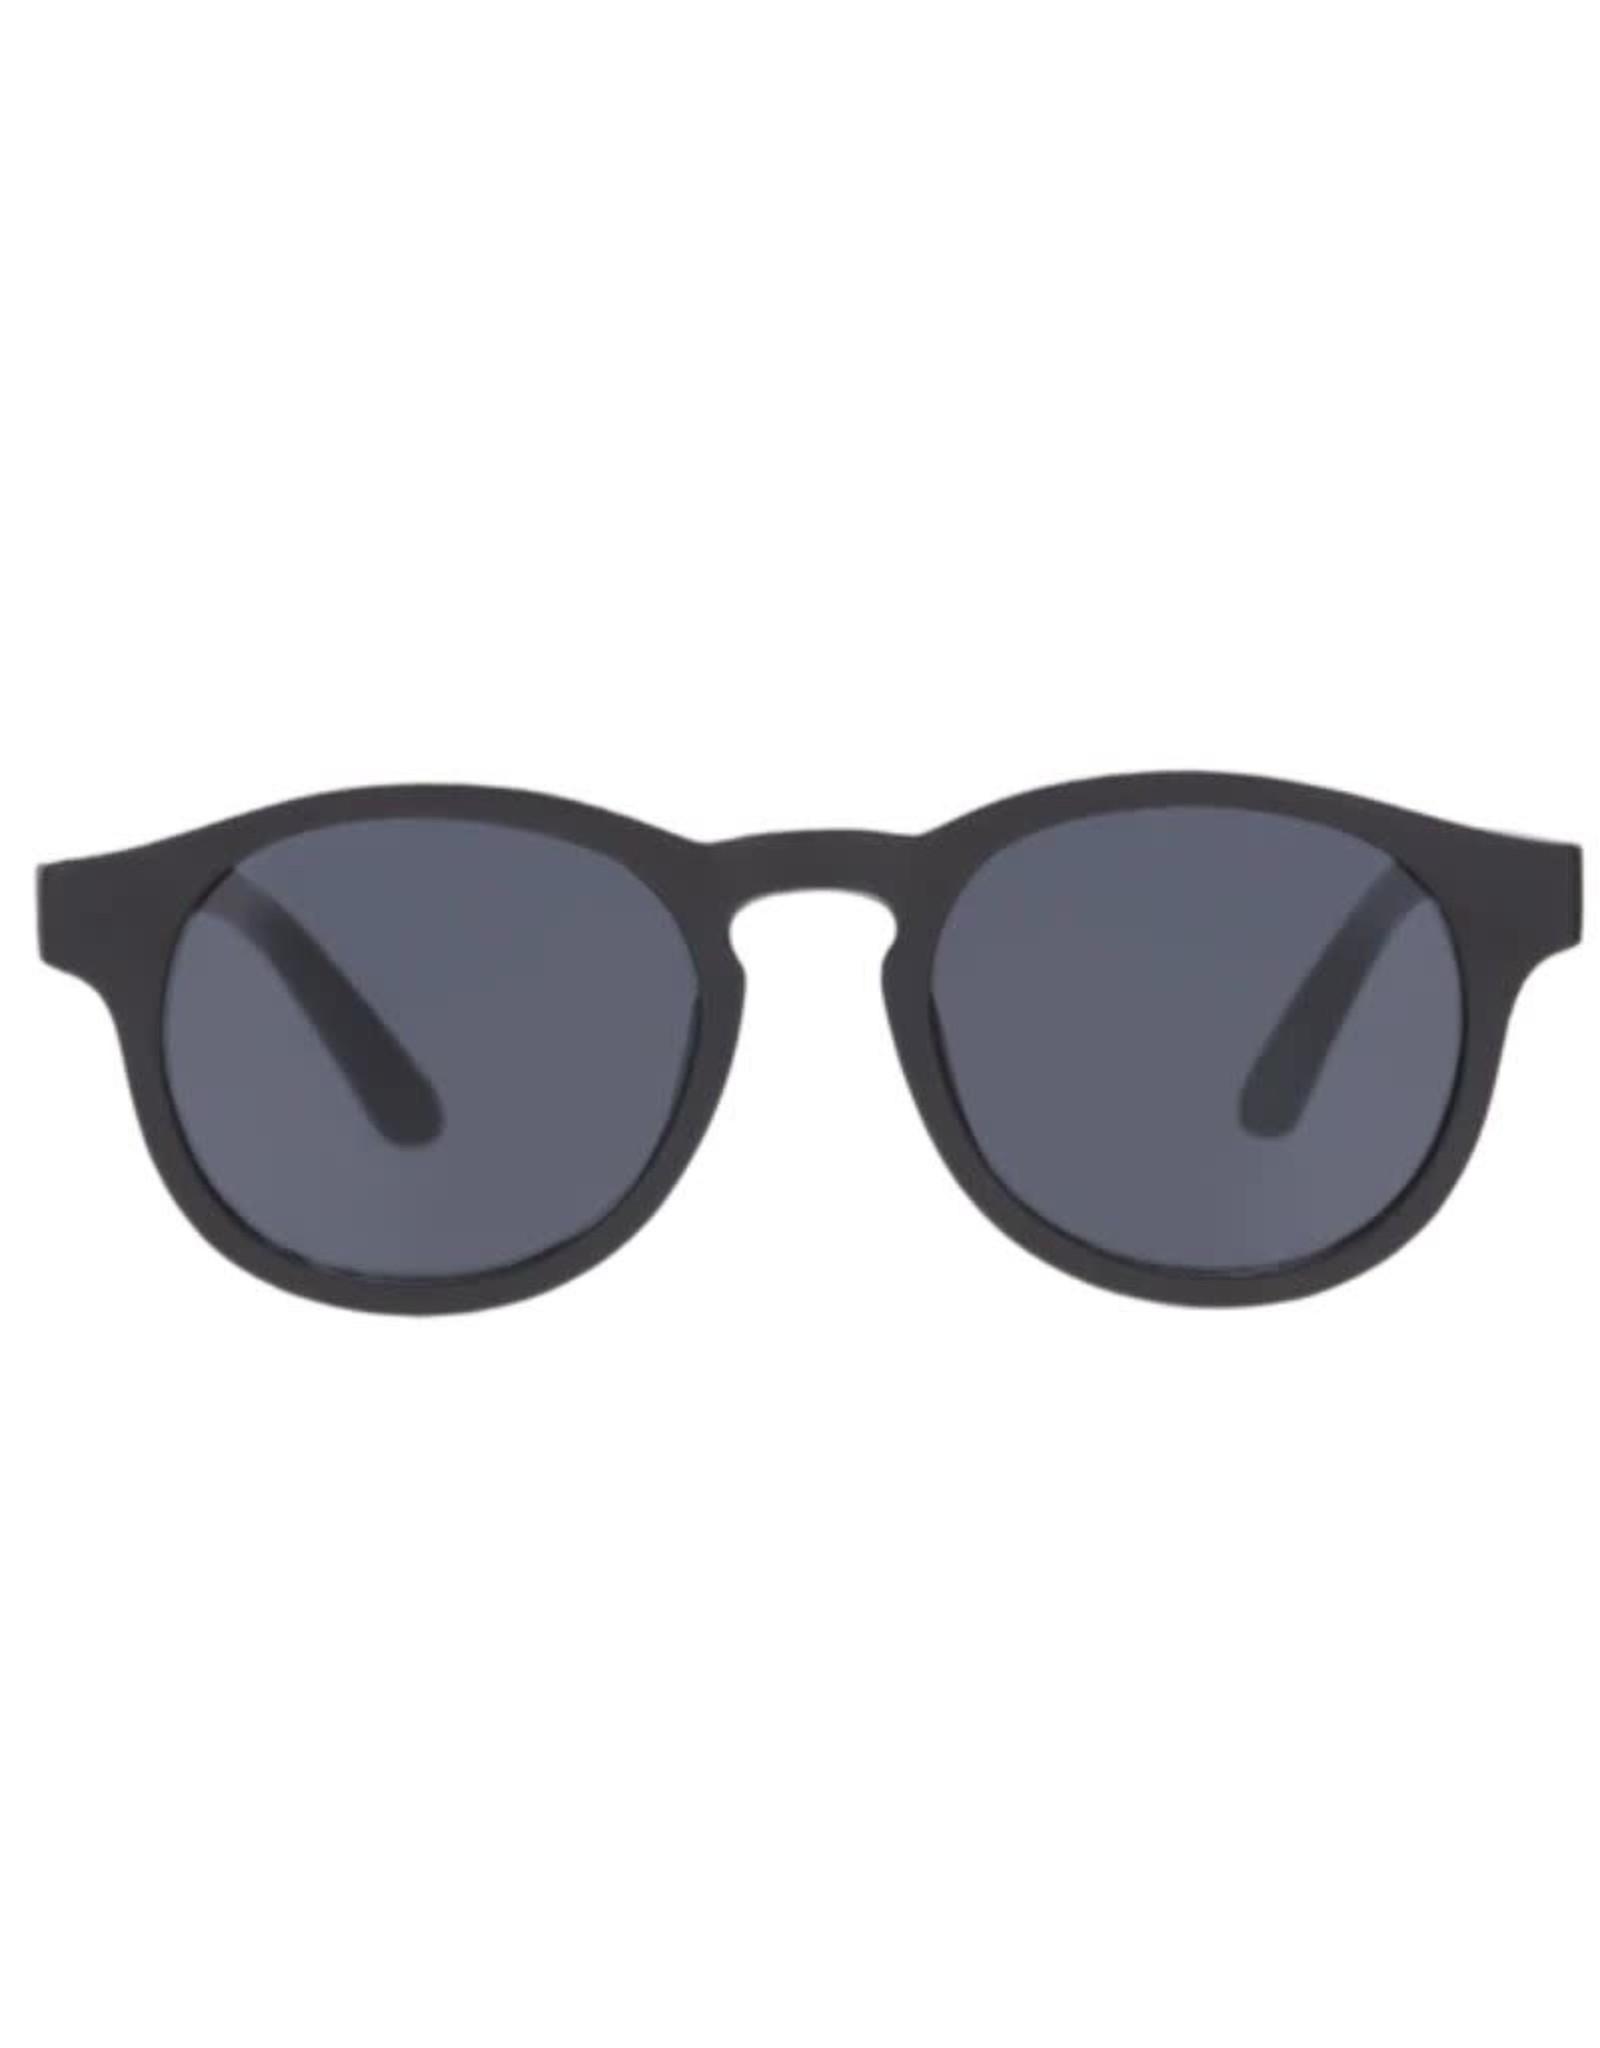 "Babiators ""Black Ops Black"" Sunglasses"